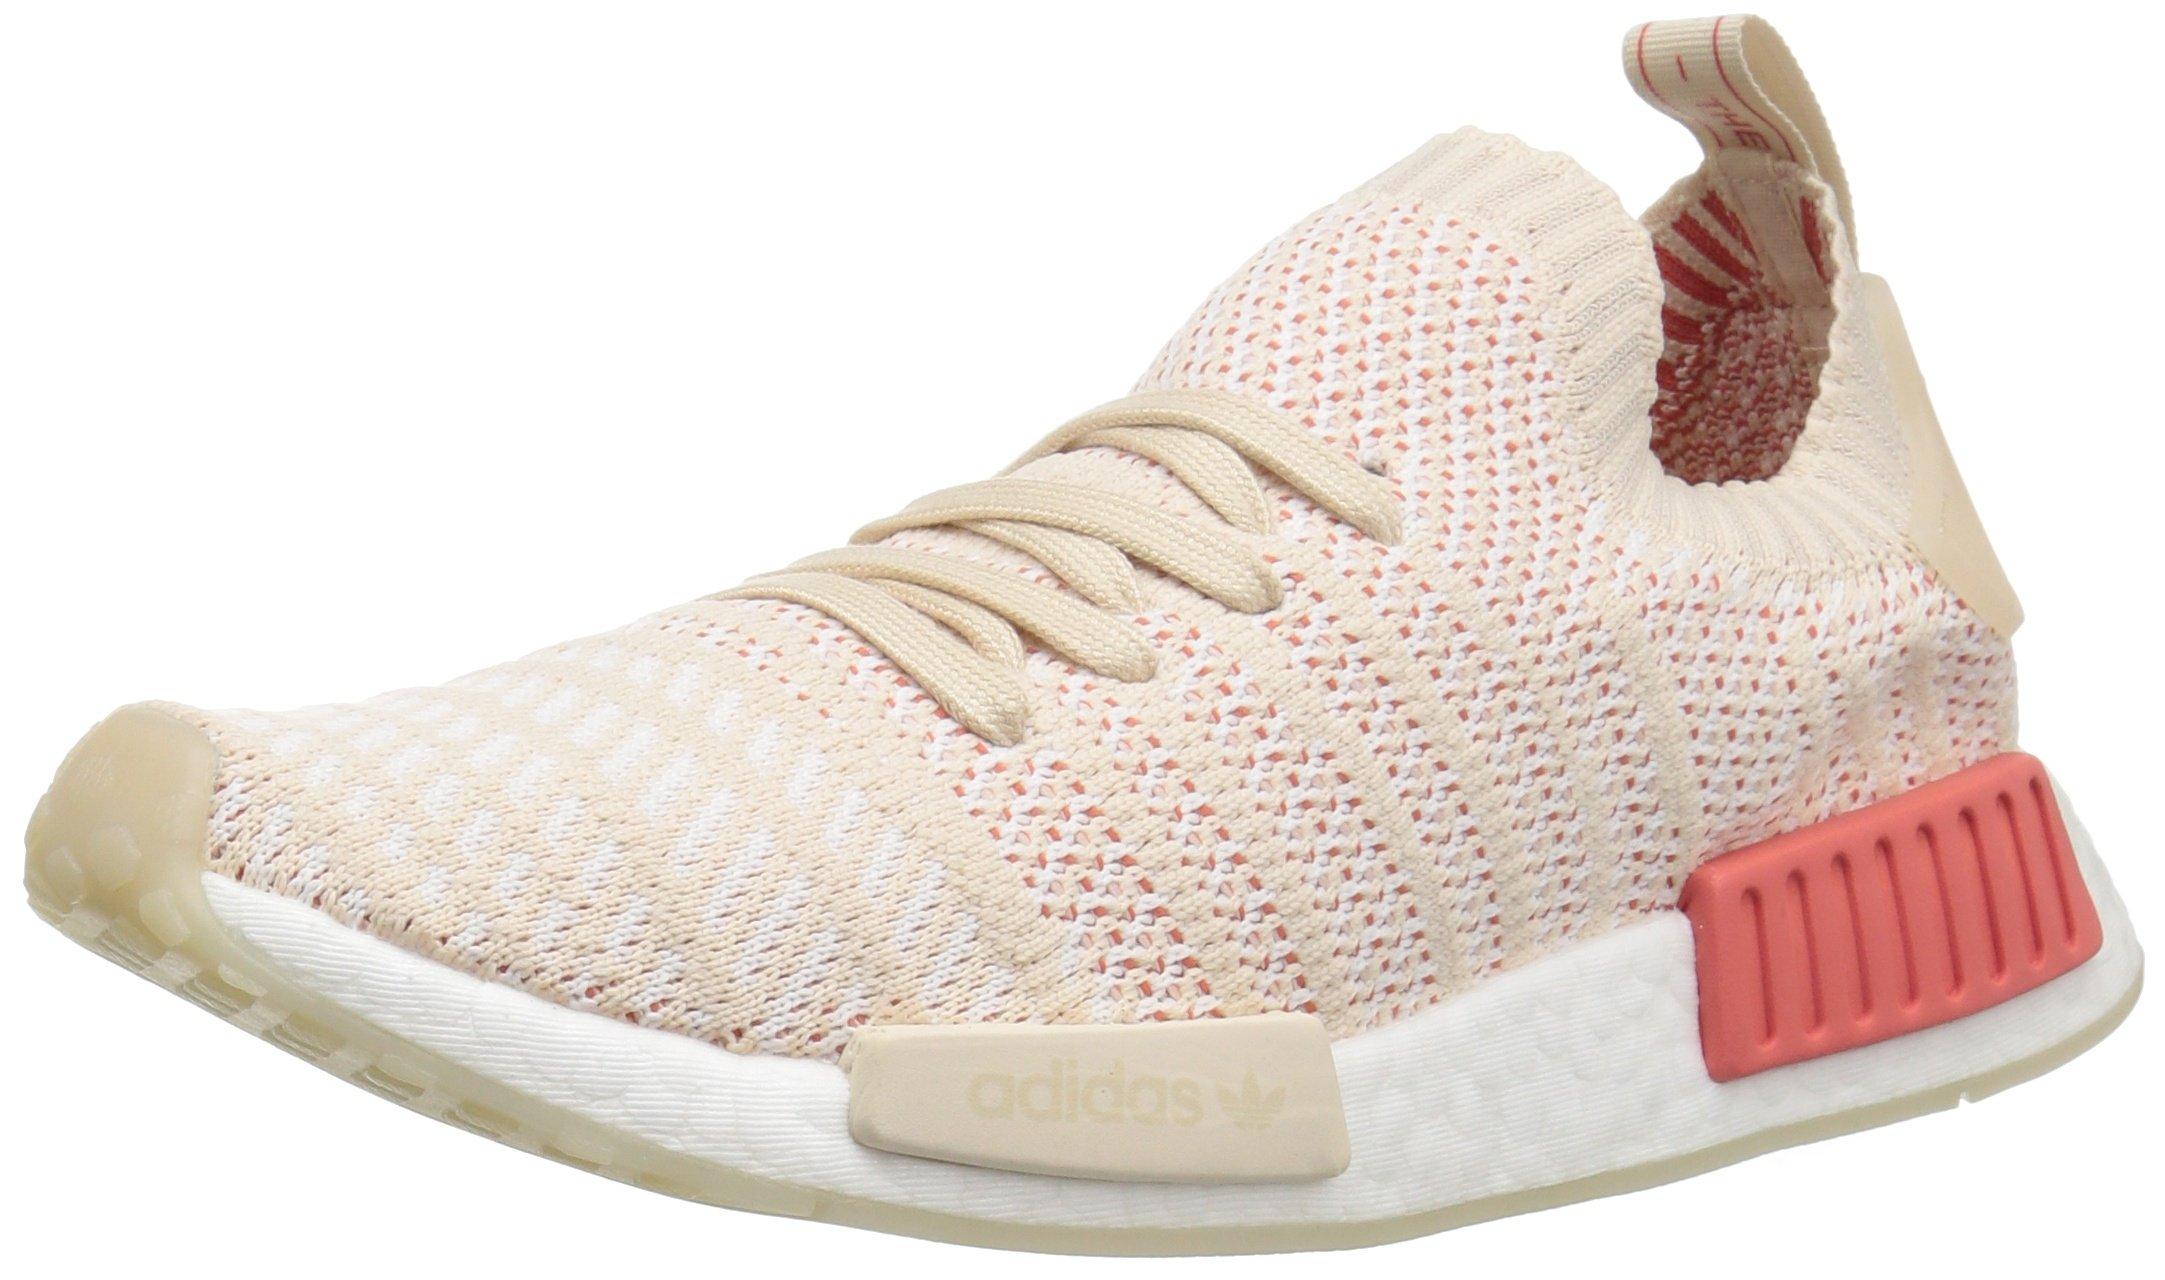 81b 78zm36L - adidas Originals Women's NMD_r1 Stlt Pk Running Shoe